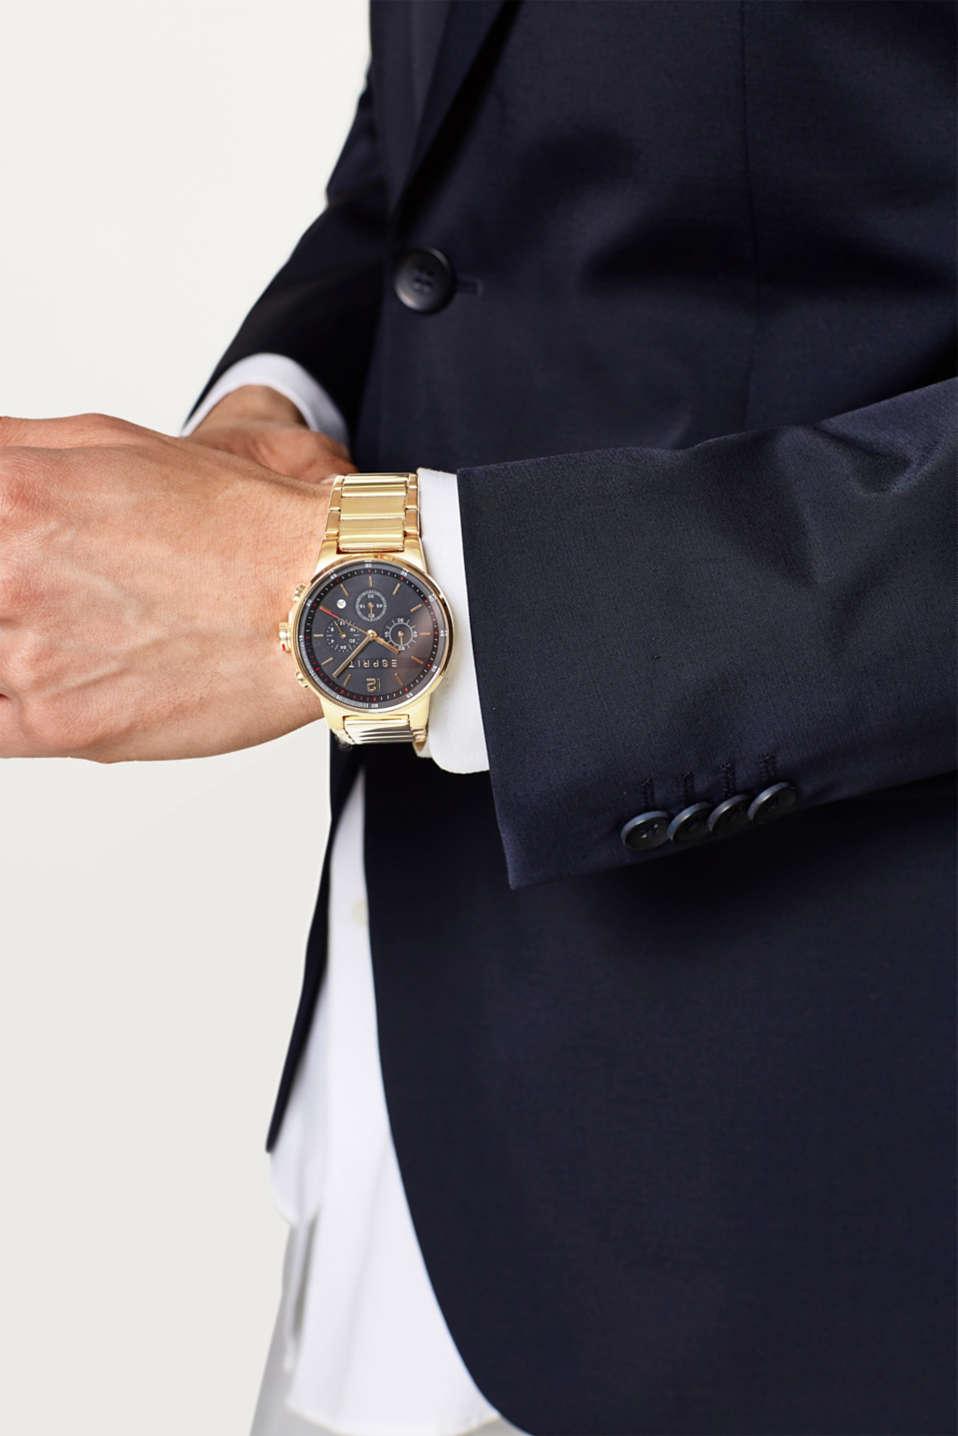 Stainless steel chronograph + link bracelet, GOLD, detail image number 2